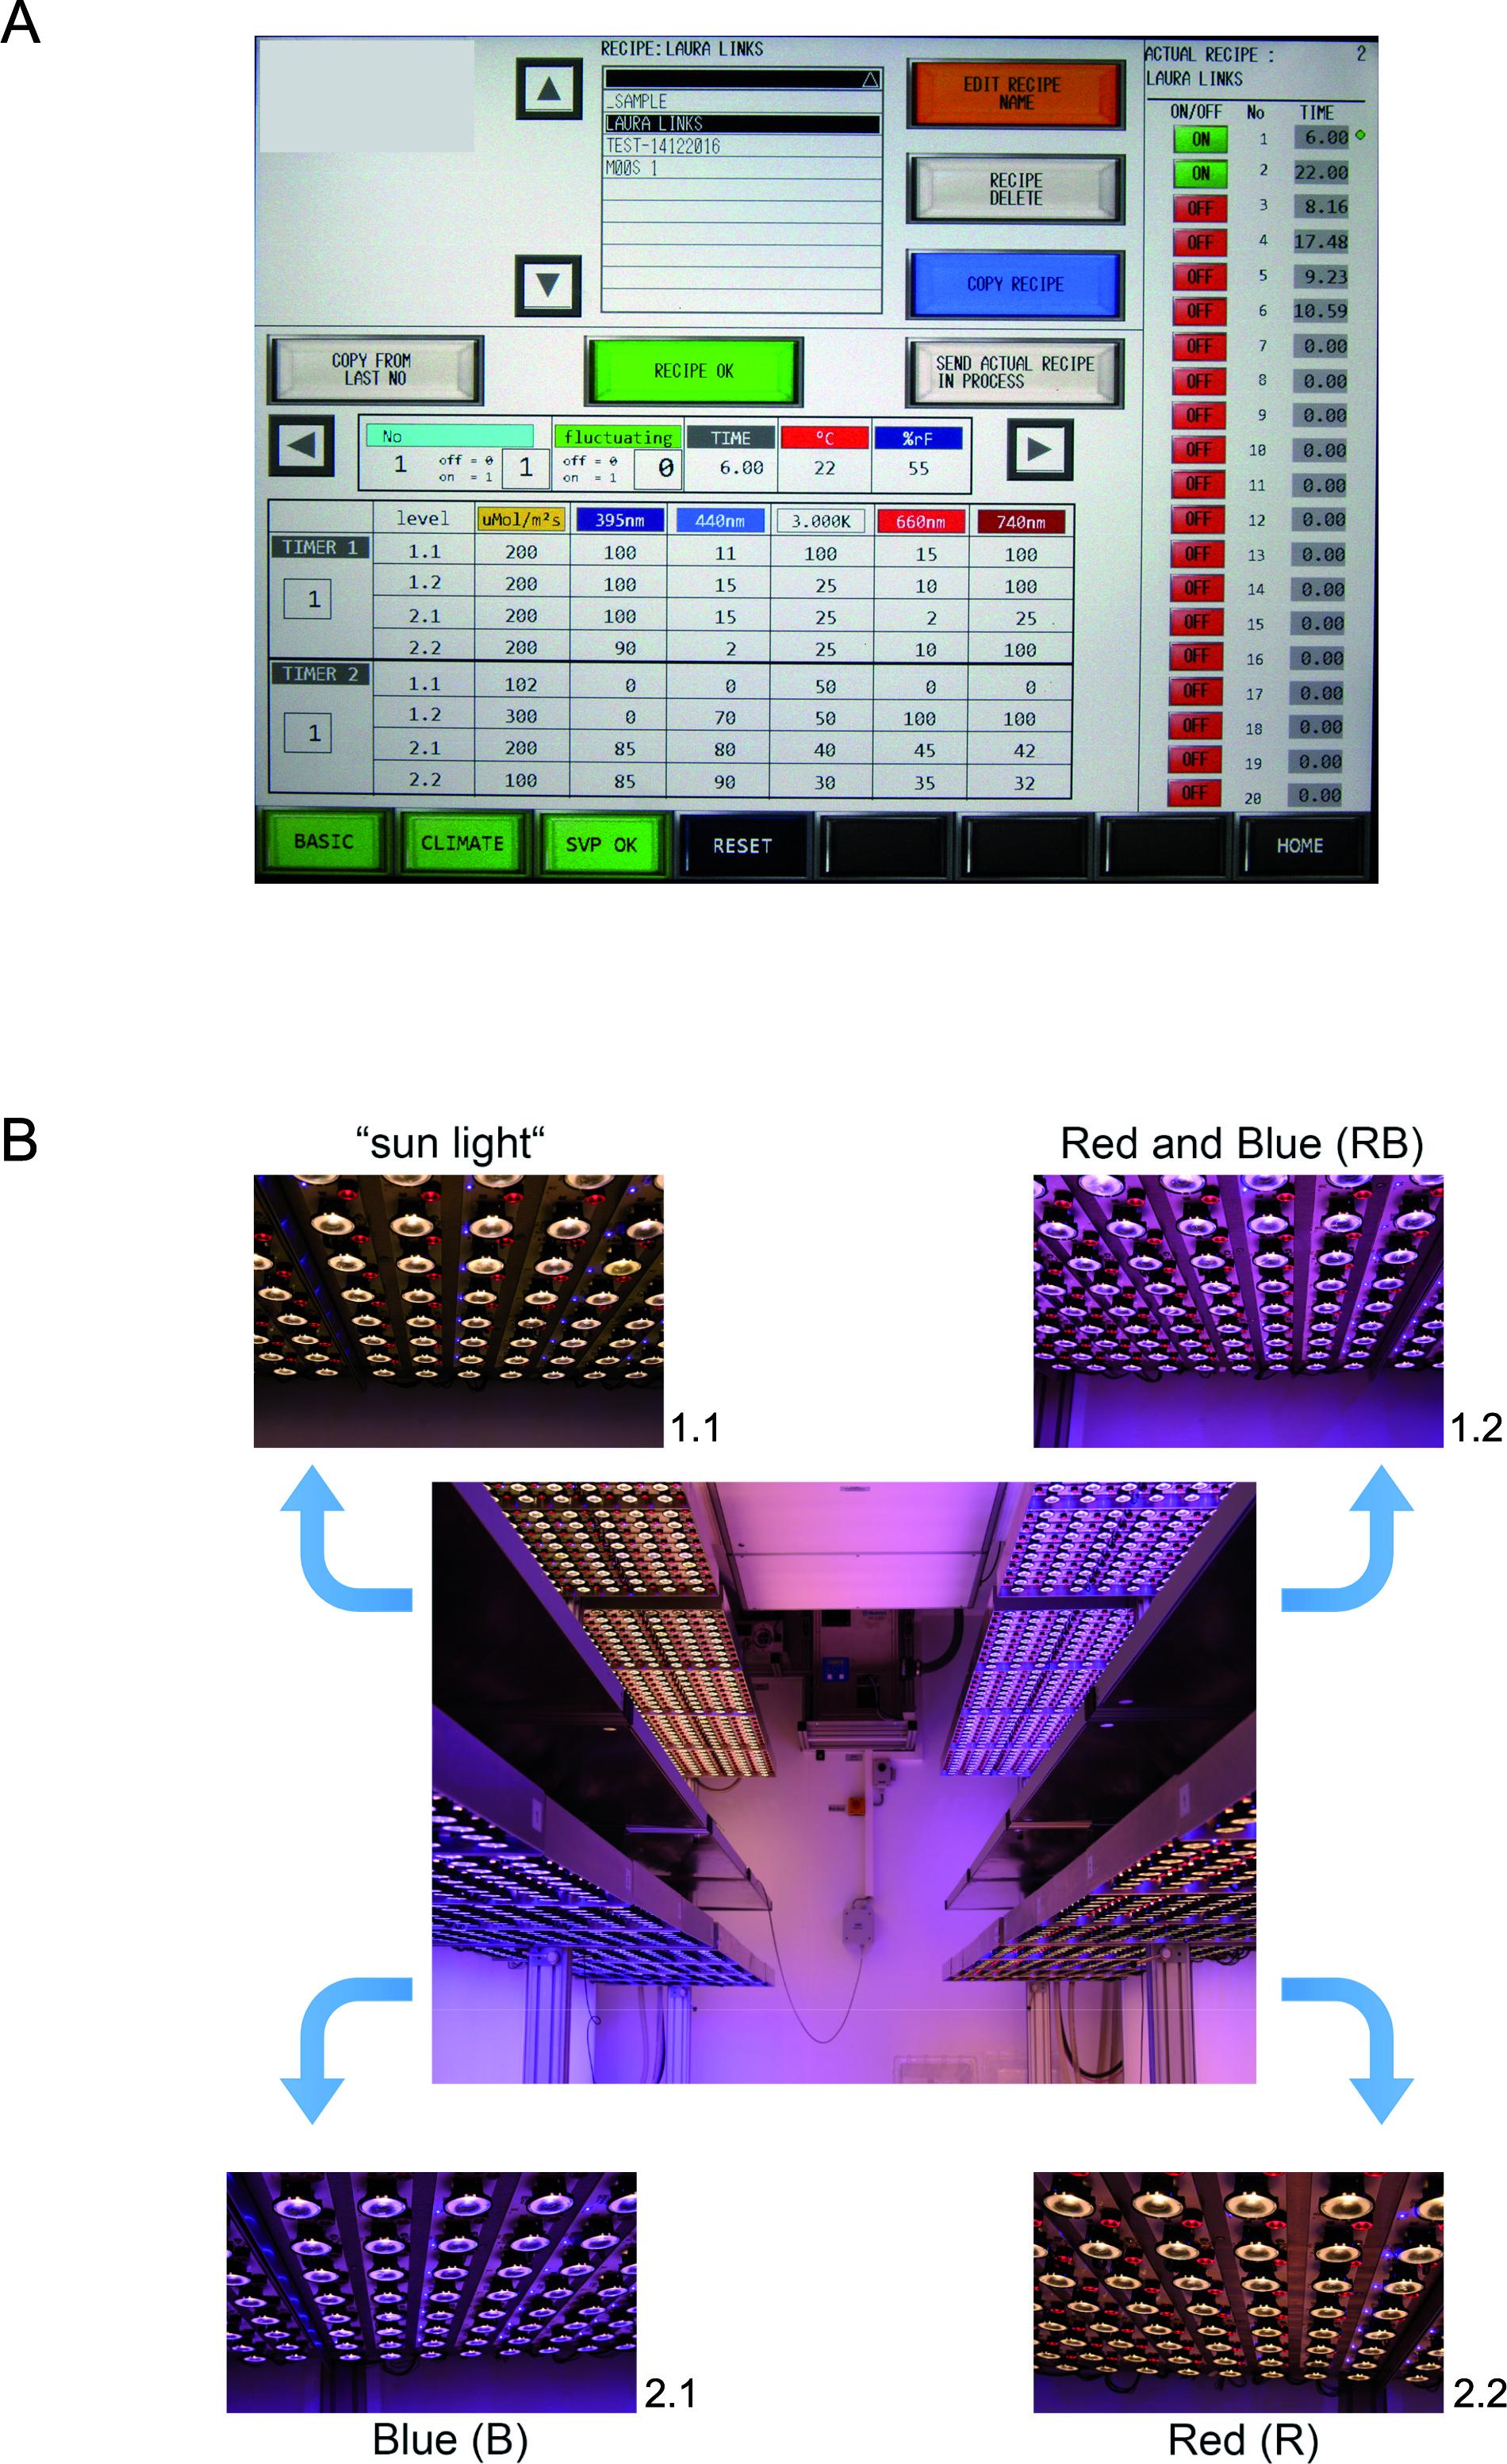 Analysis of Arabidopsis thaliana Growth Behavior in